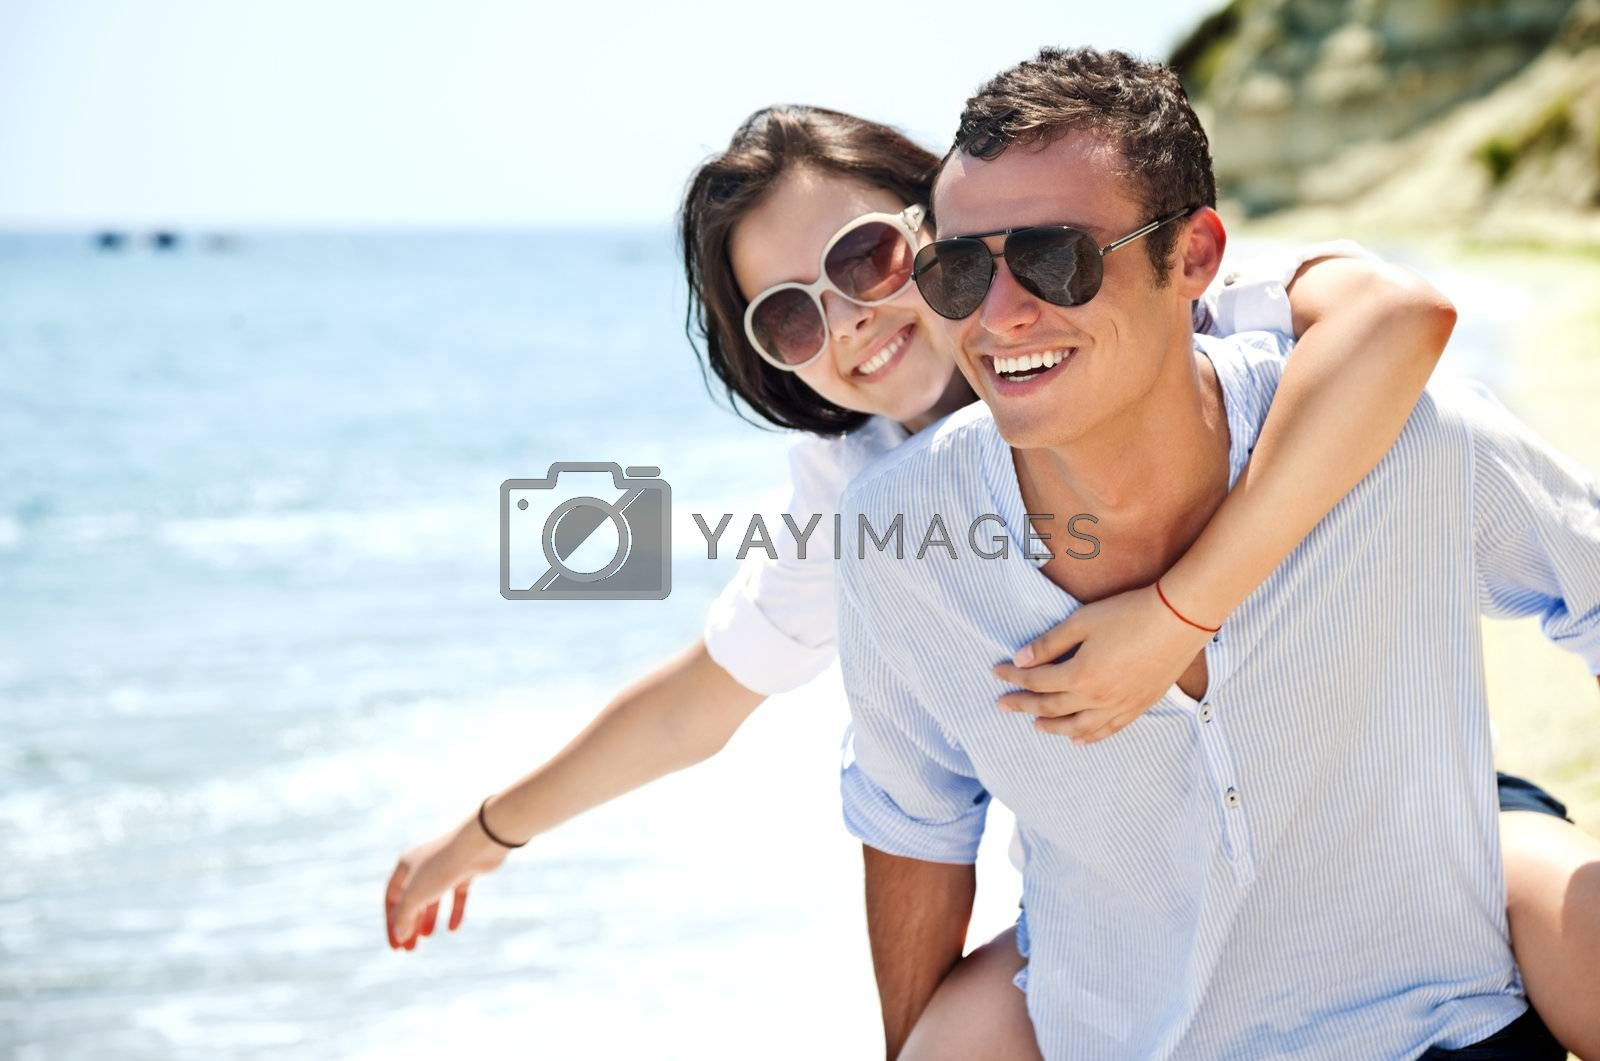 piggyback ride to beautiful female on solitary beach, happy couple